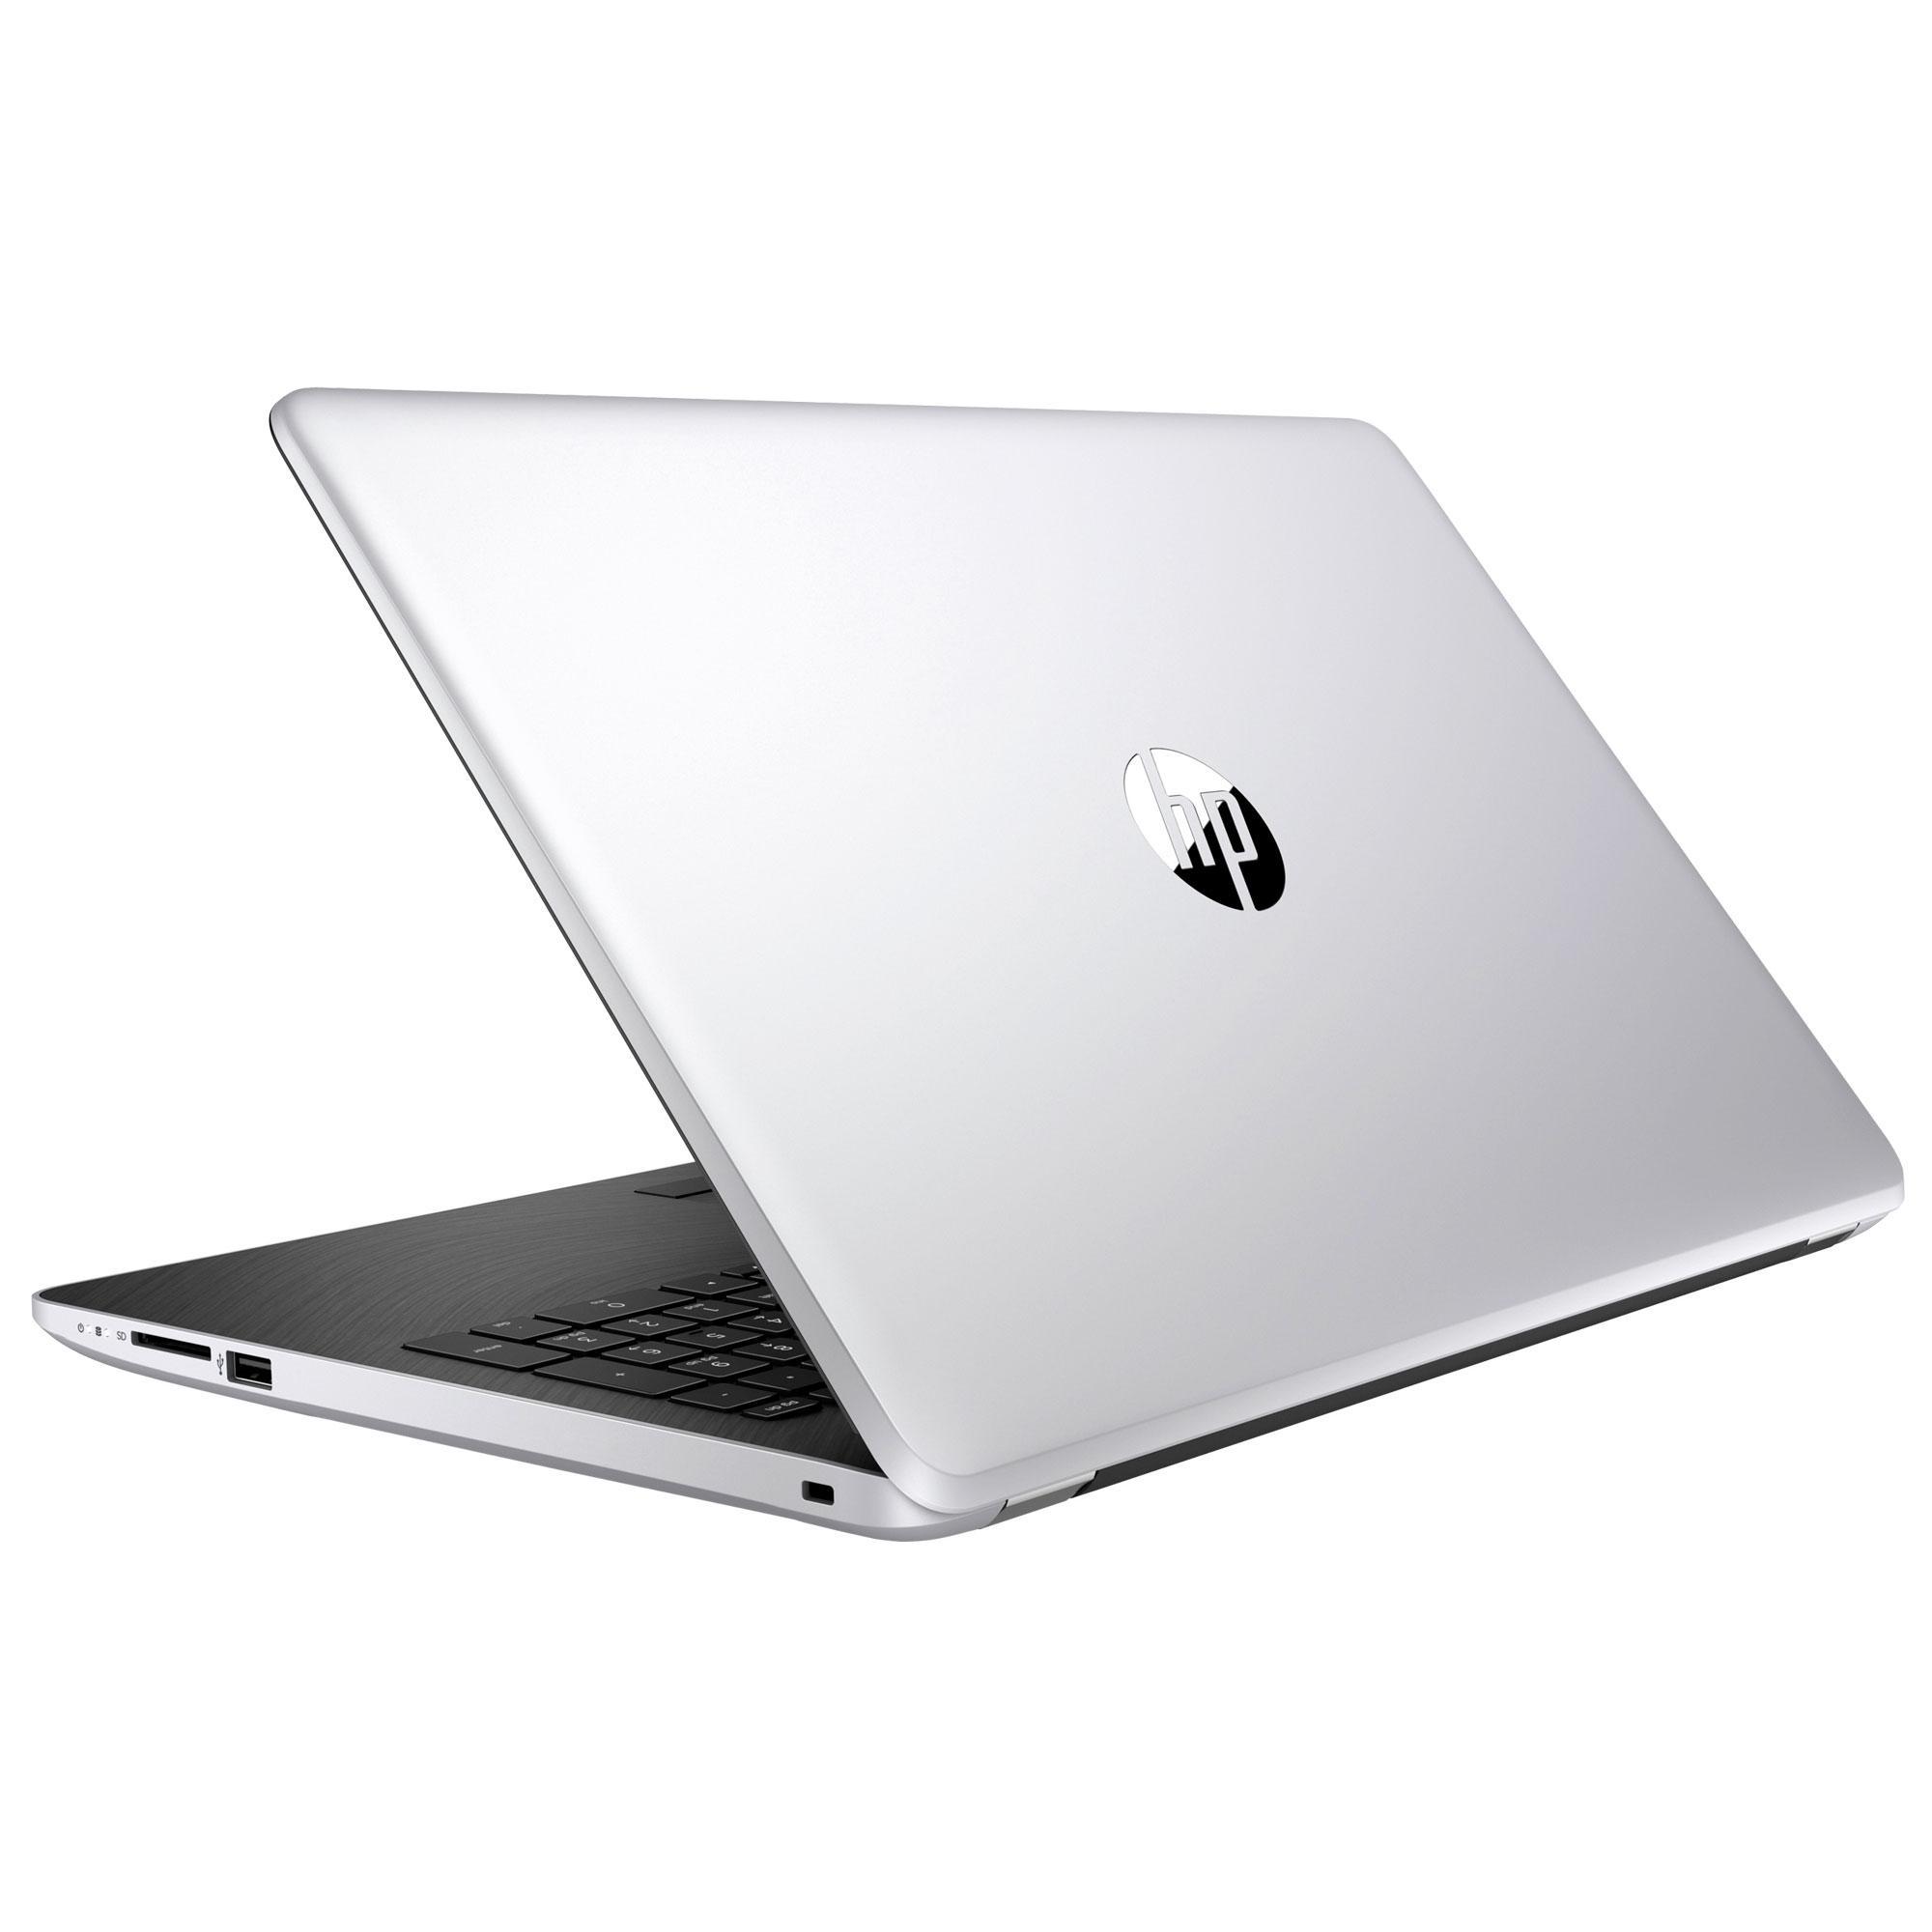 "HP Notebook 15-bs127ns - Ordenador Portátil 15.6"" HD"